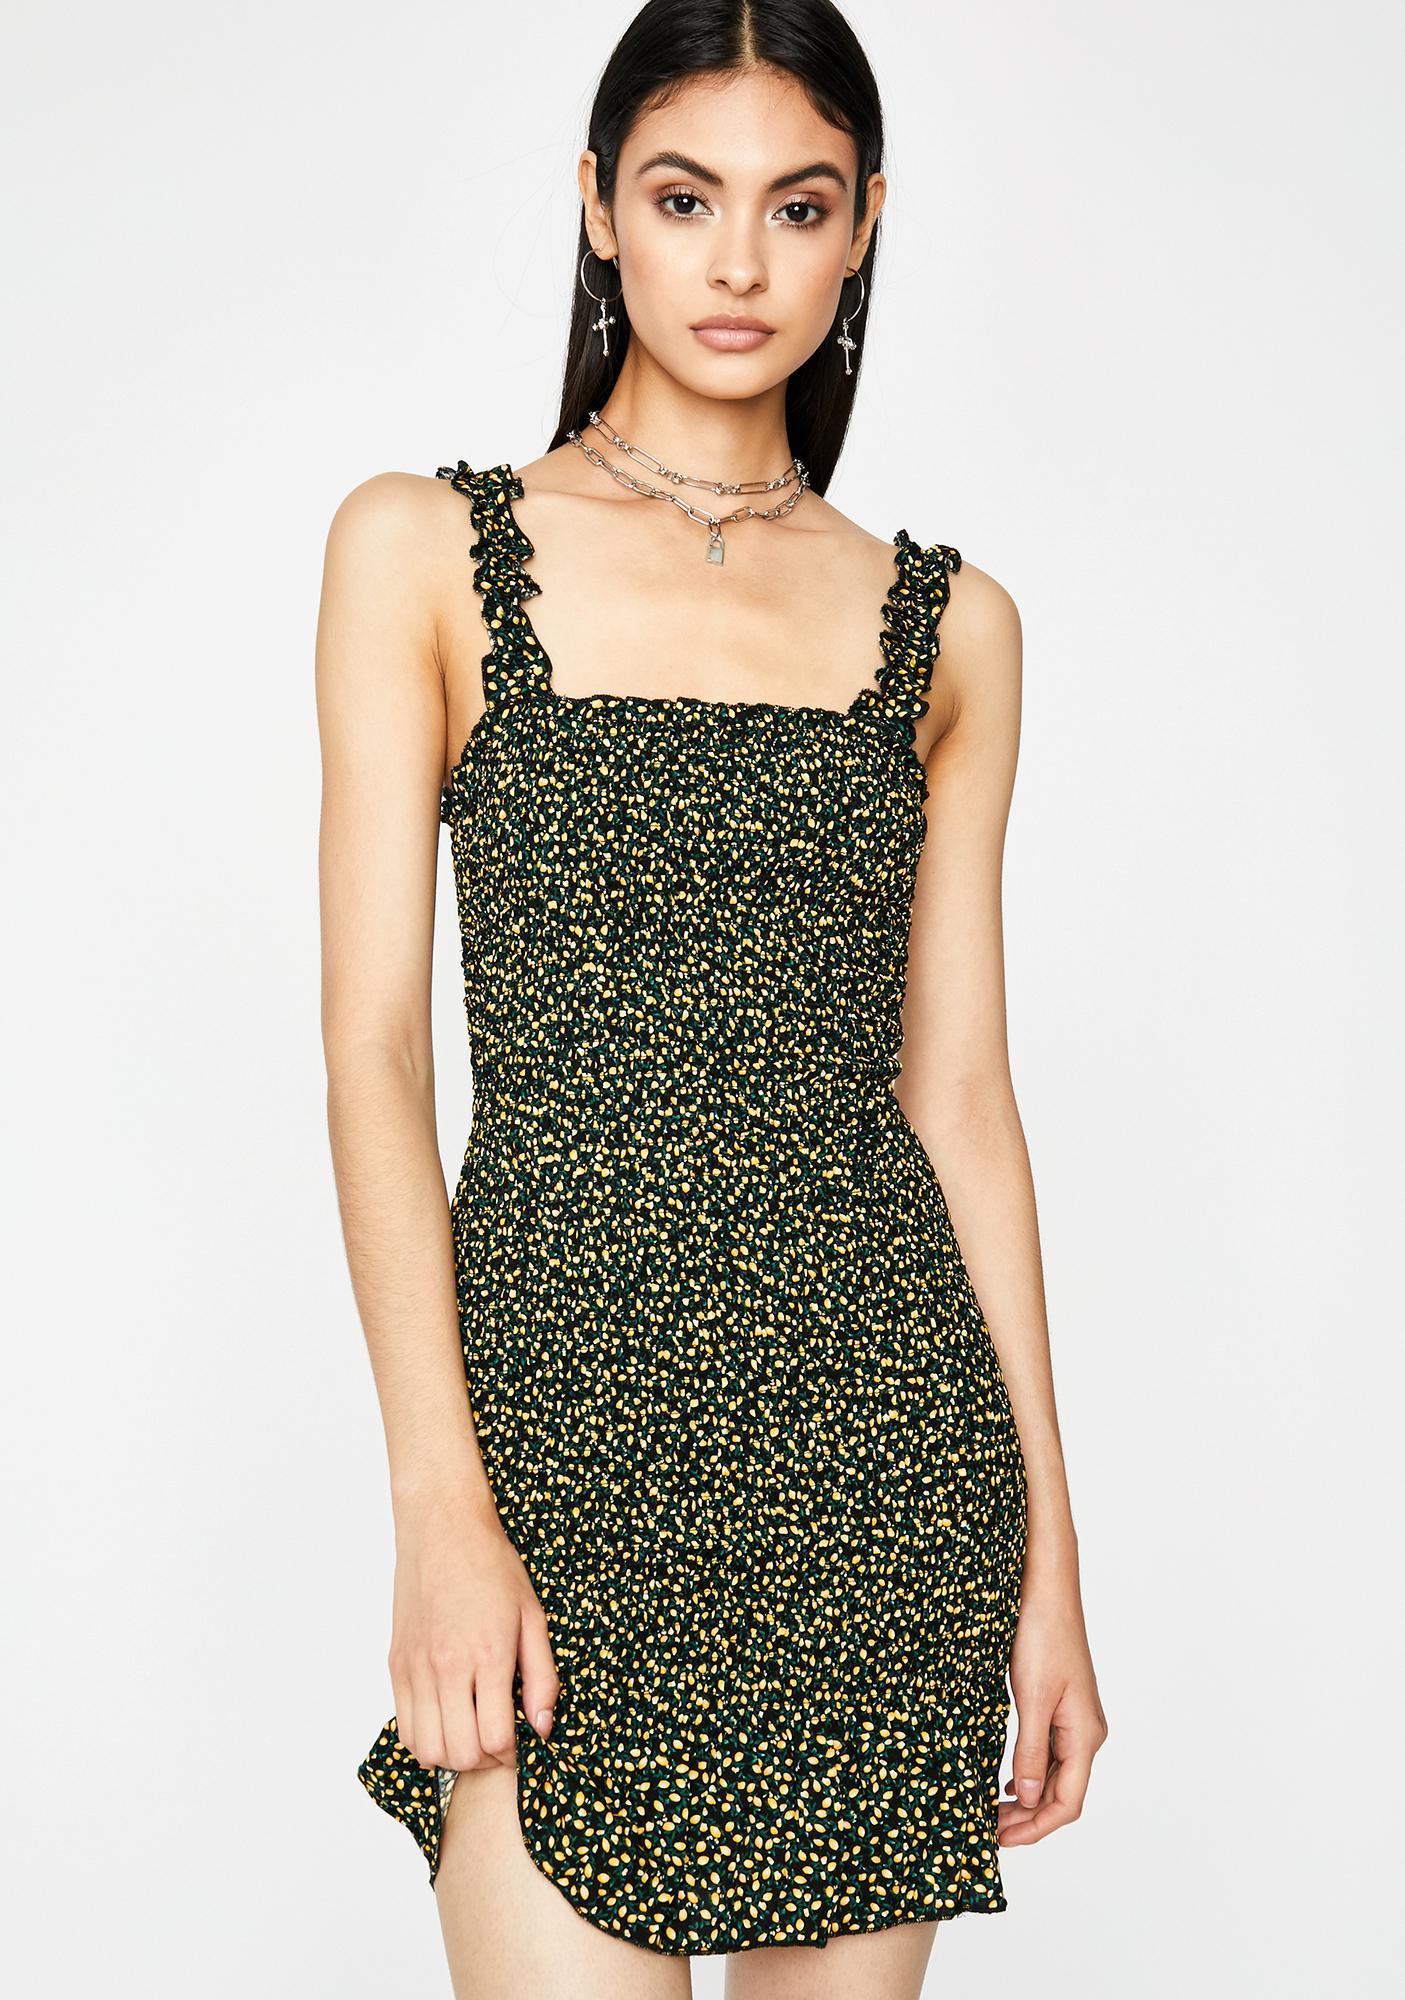 Tender Love Floral Dress